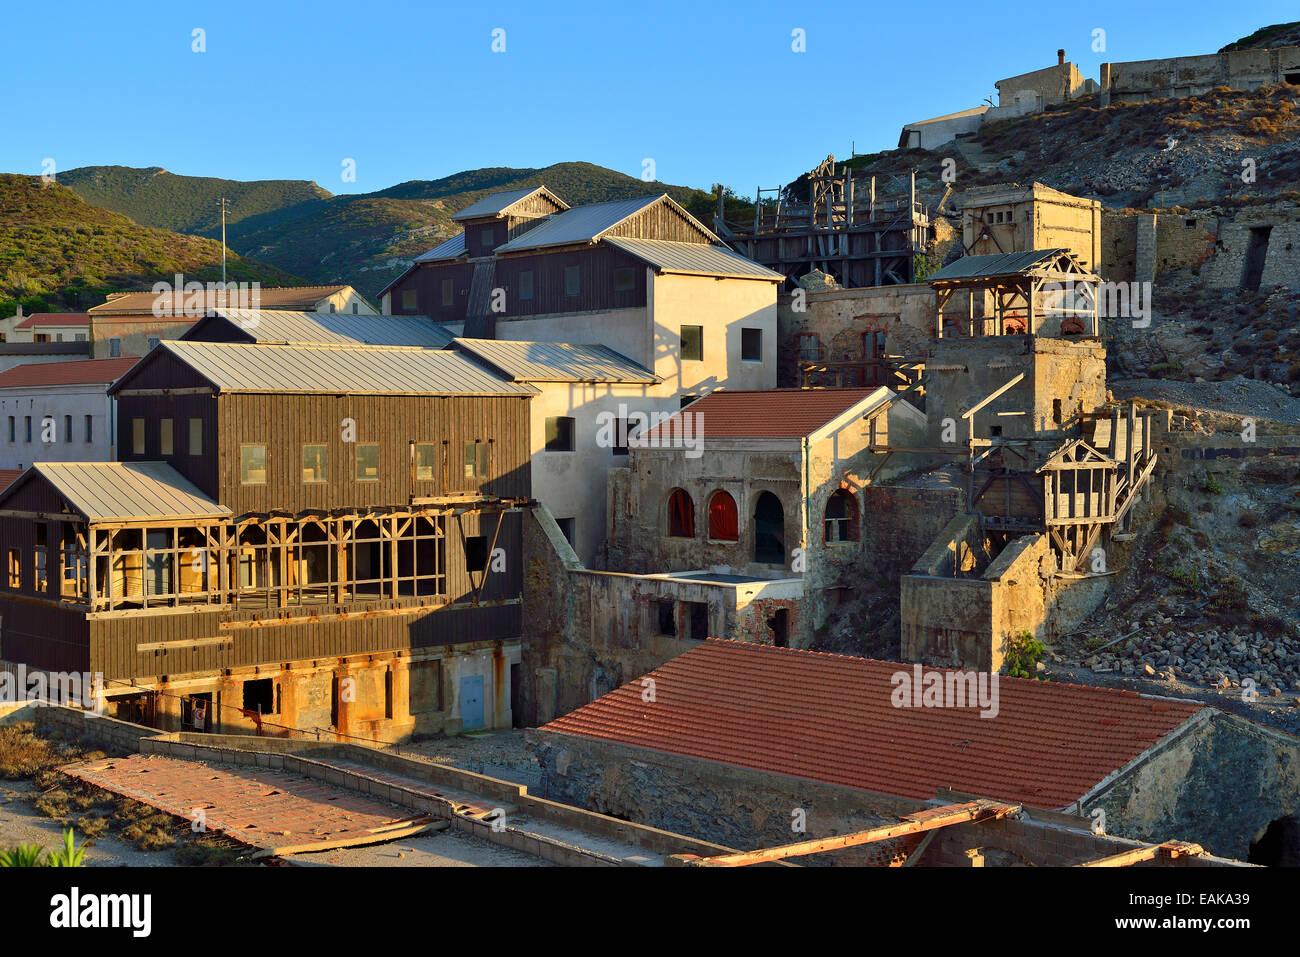 Dilapidated mining settlement, Argentiera, Sassari Province, Sardinia, Italy - Stock Image